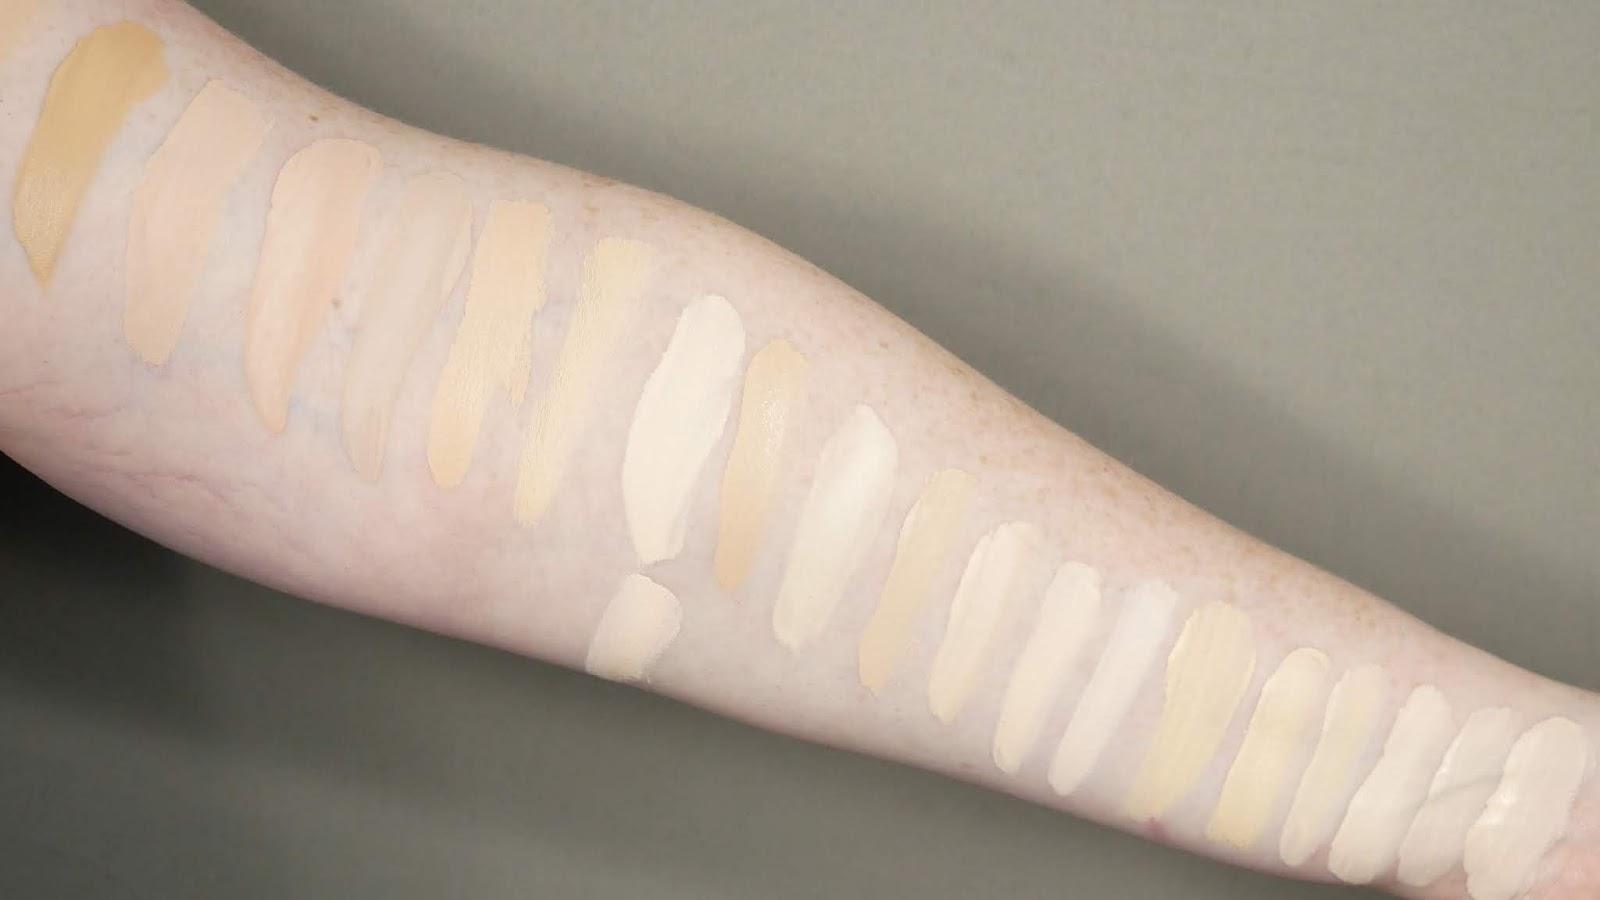 Even Better Makeup Broad Spectrum by Clinique #3